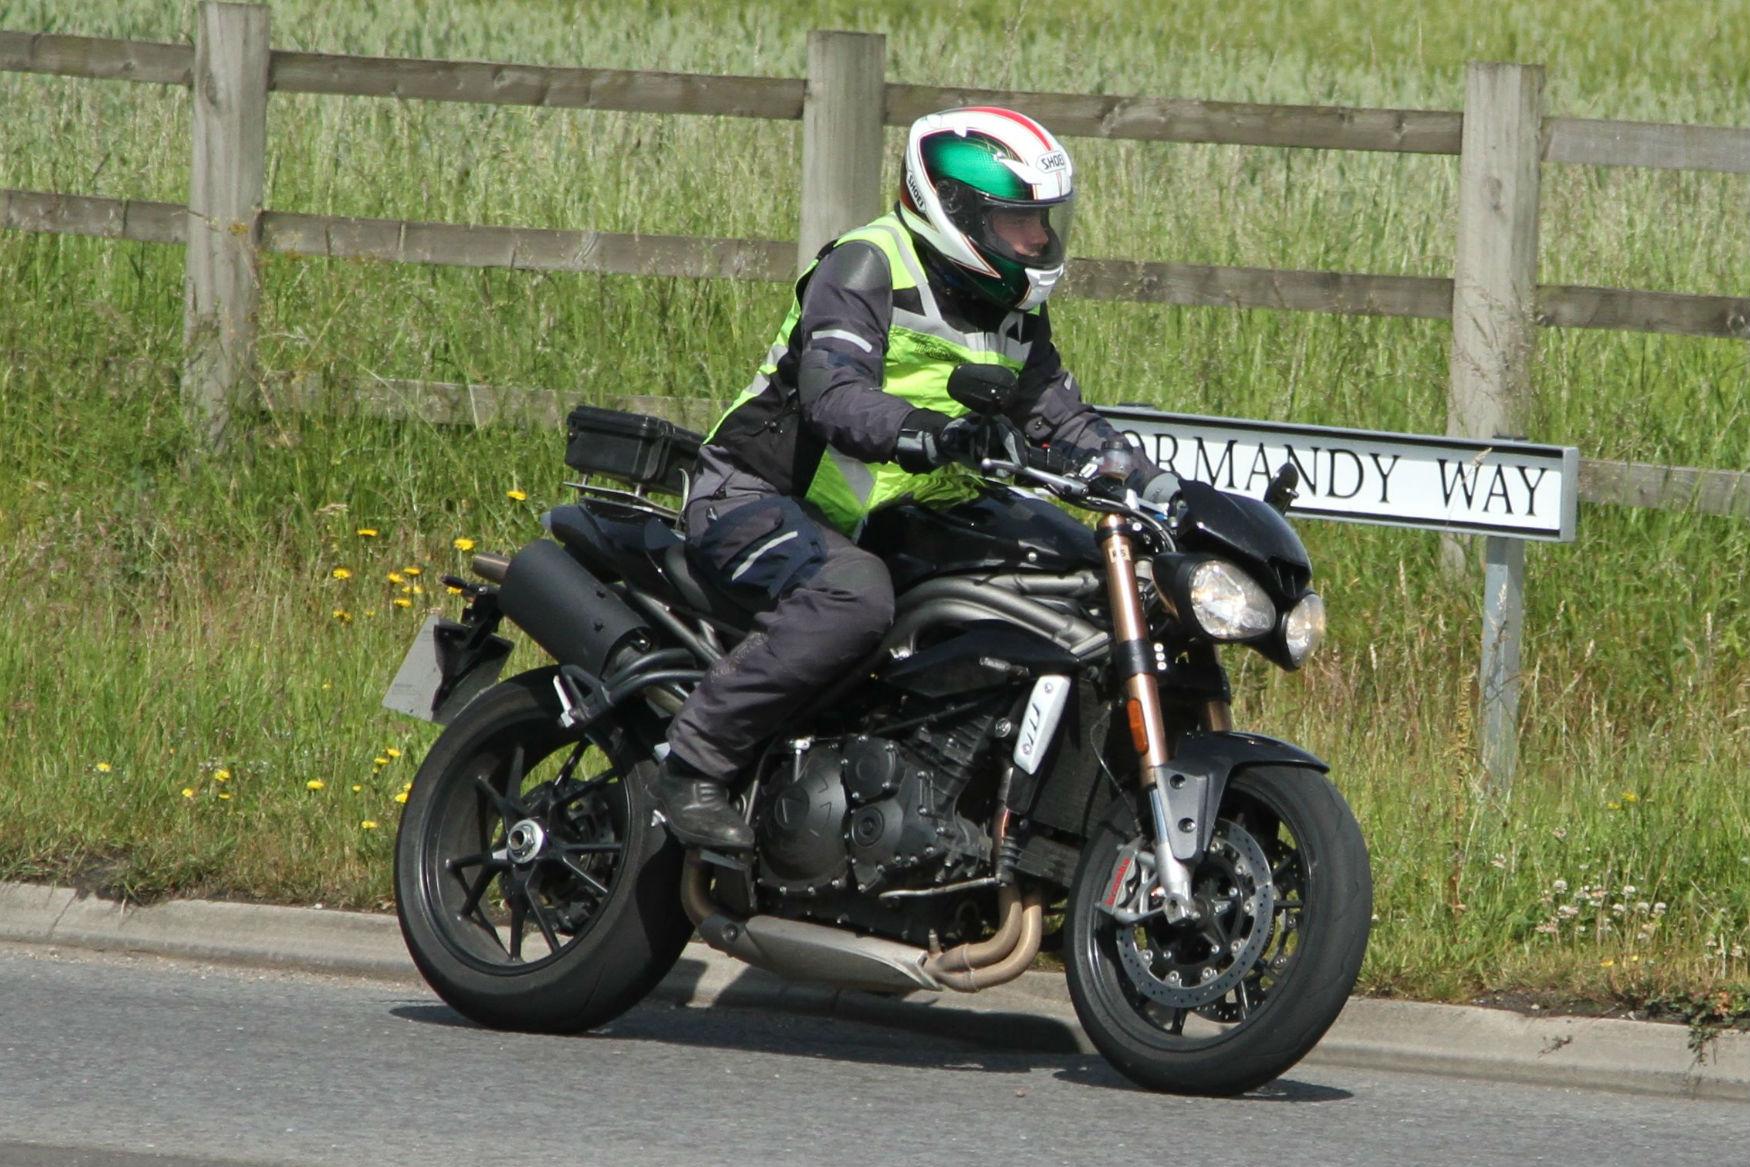 New Triumph Speed Triples revealed